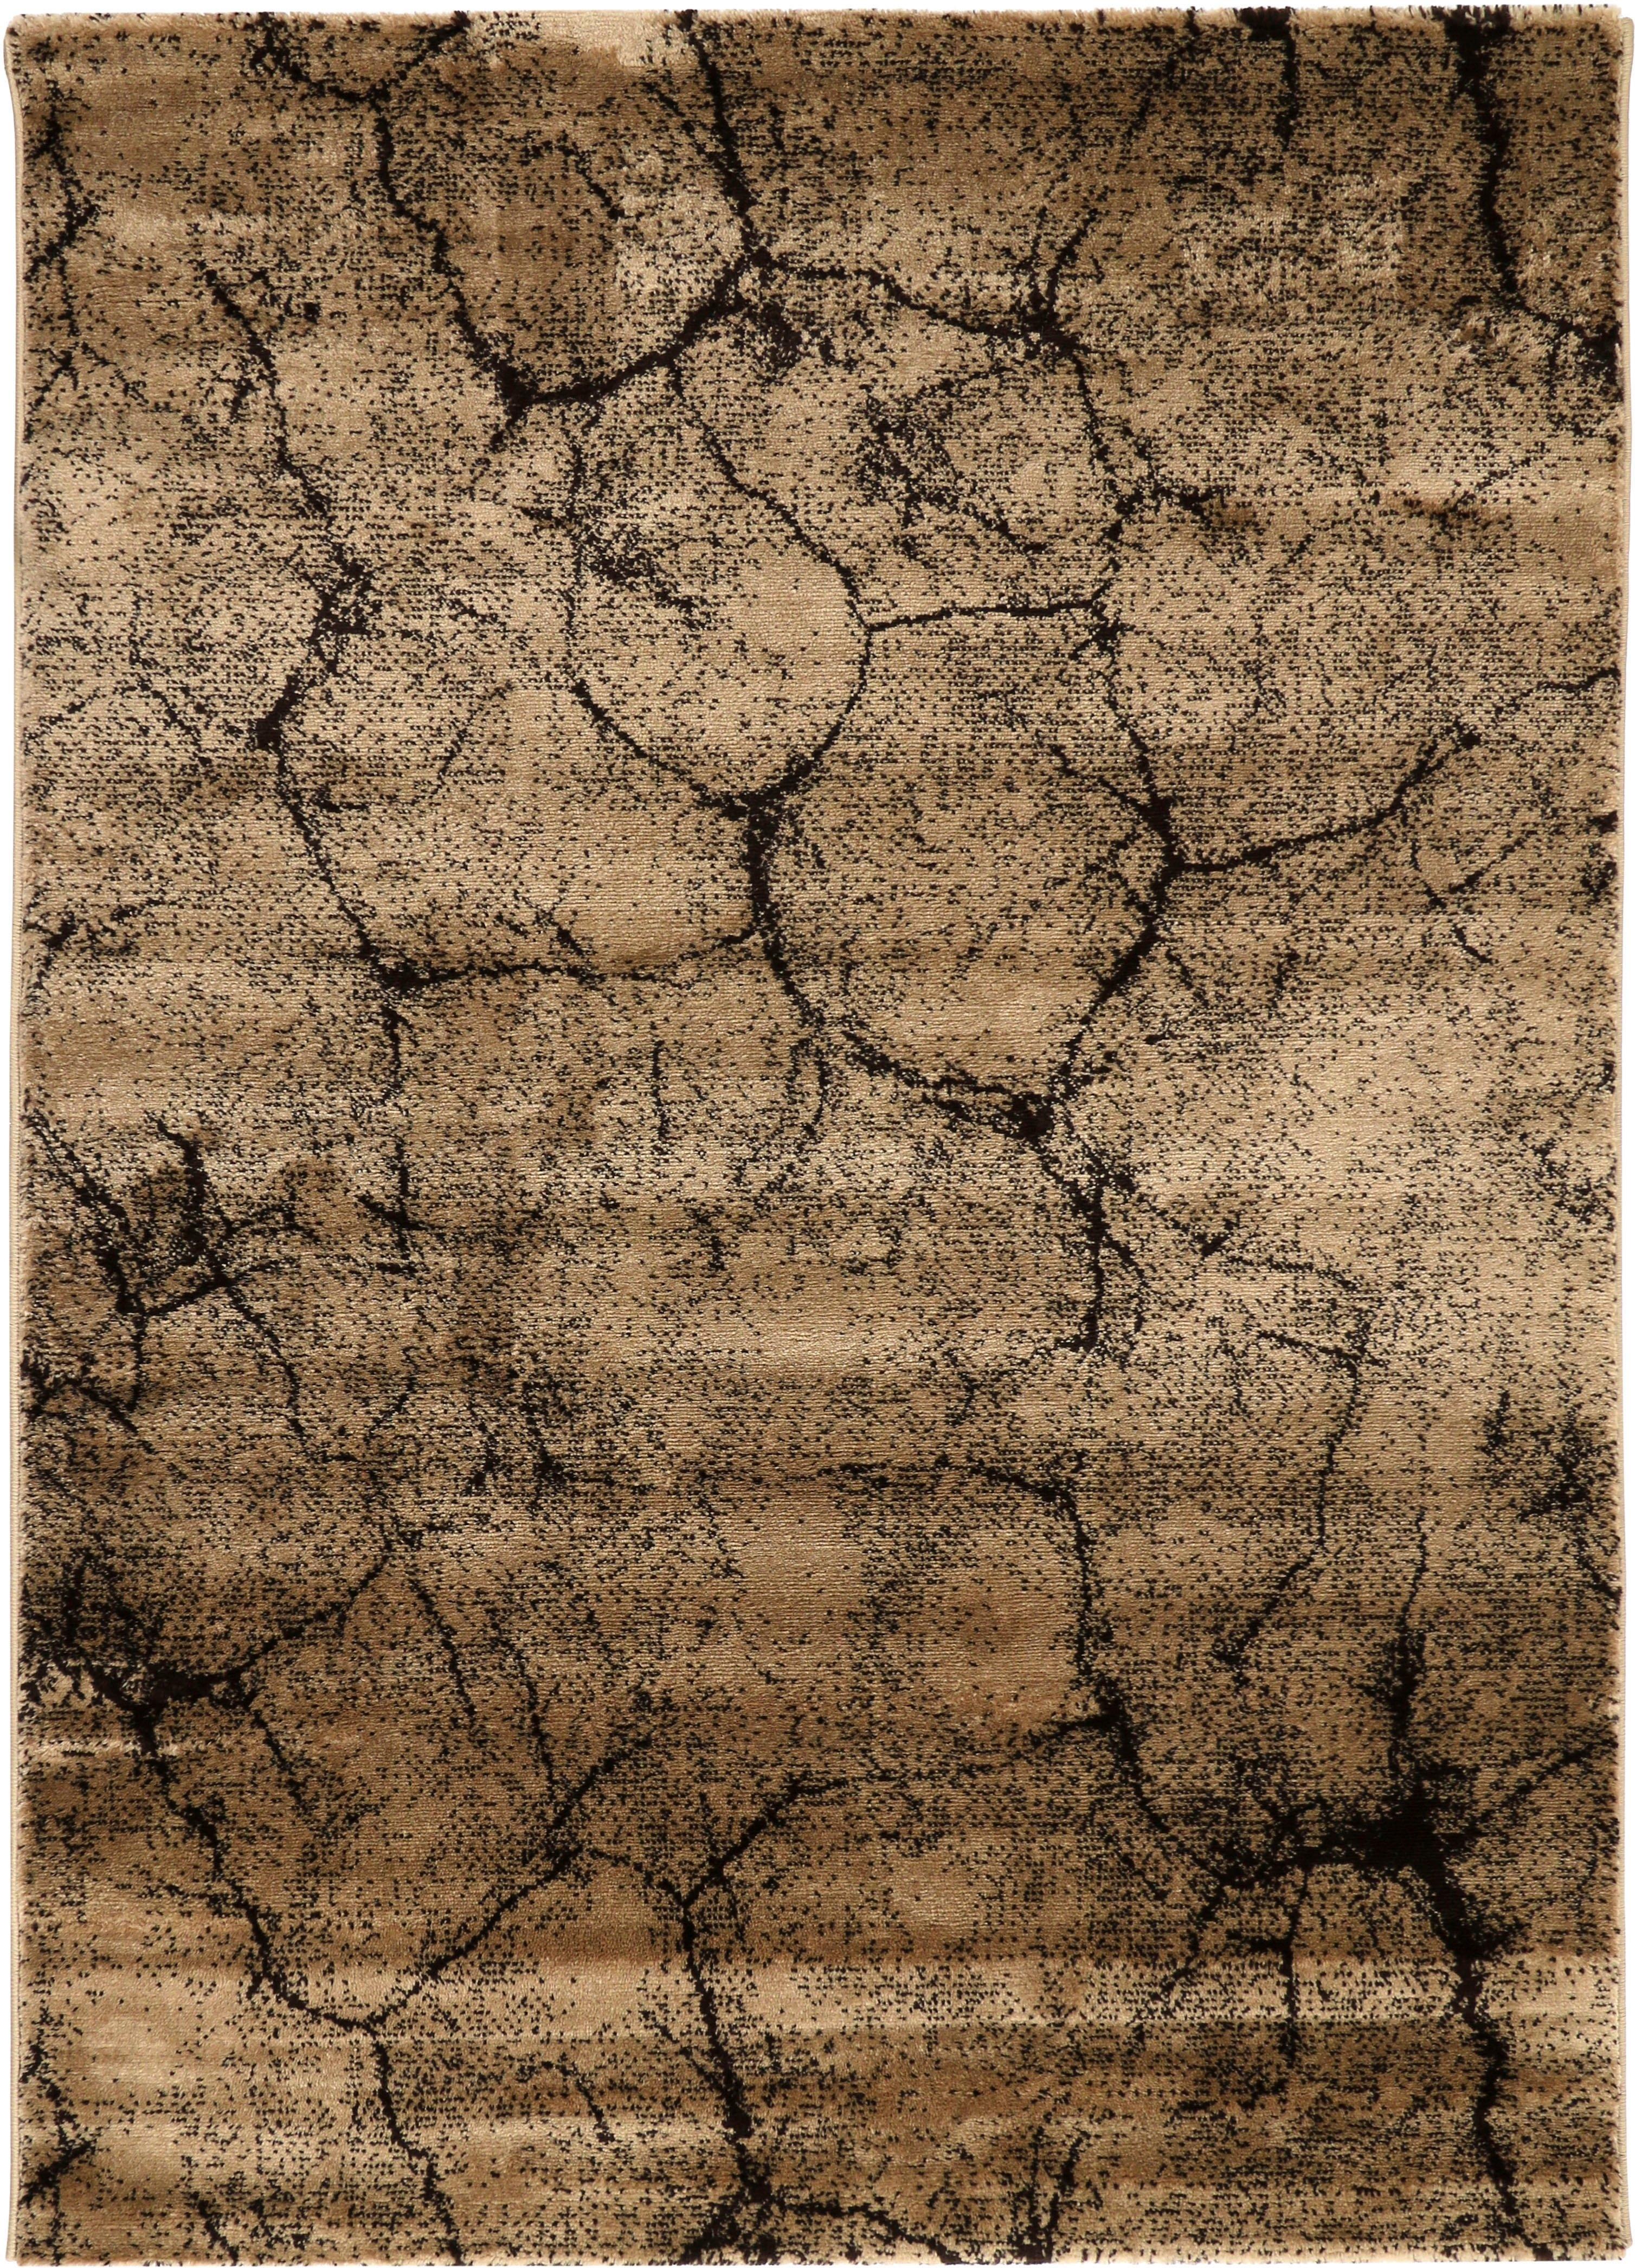 RESITAL The Voice of Carpet vloerkleed Side 245 Korte pool, geweven, modern design, woonkamer - verschillende betaalmethodes